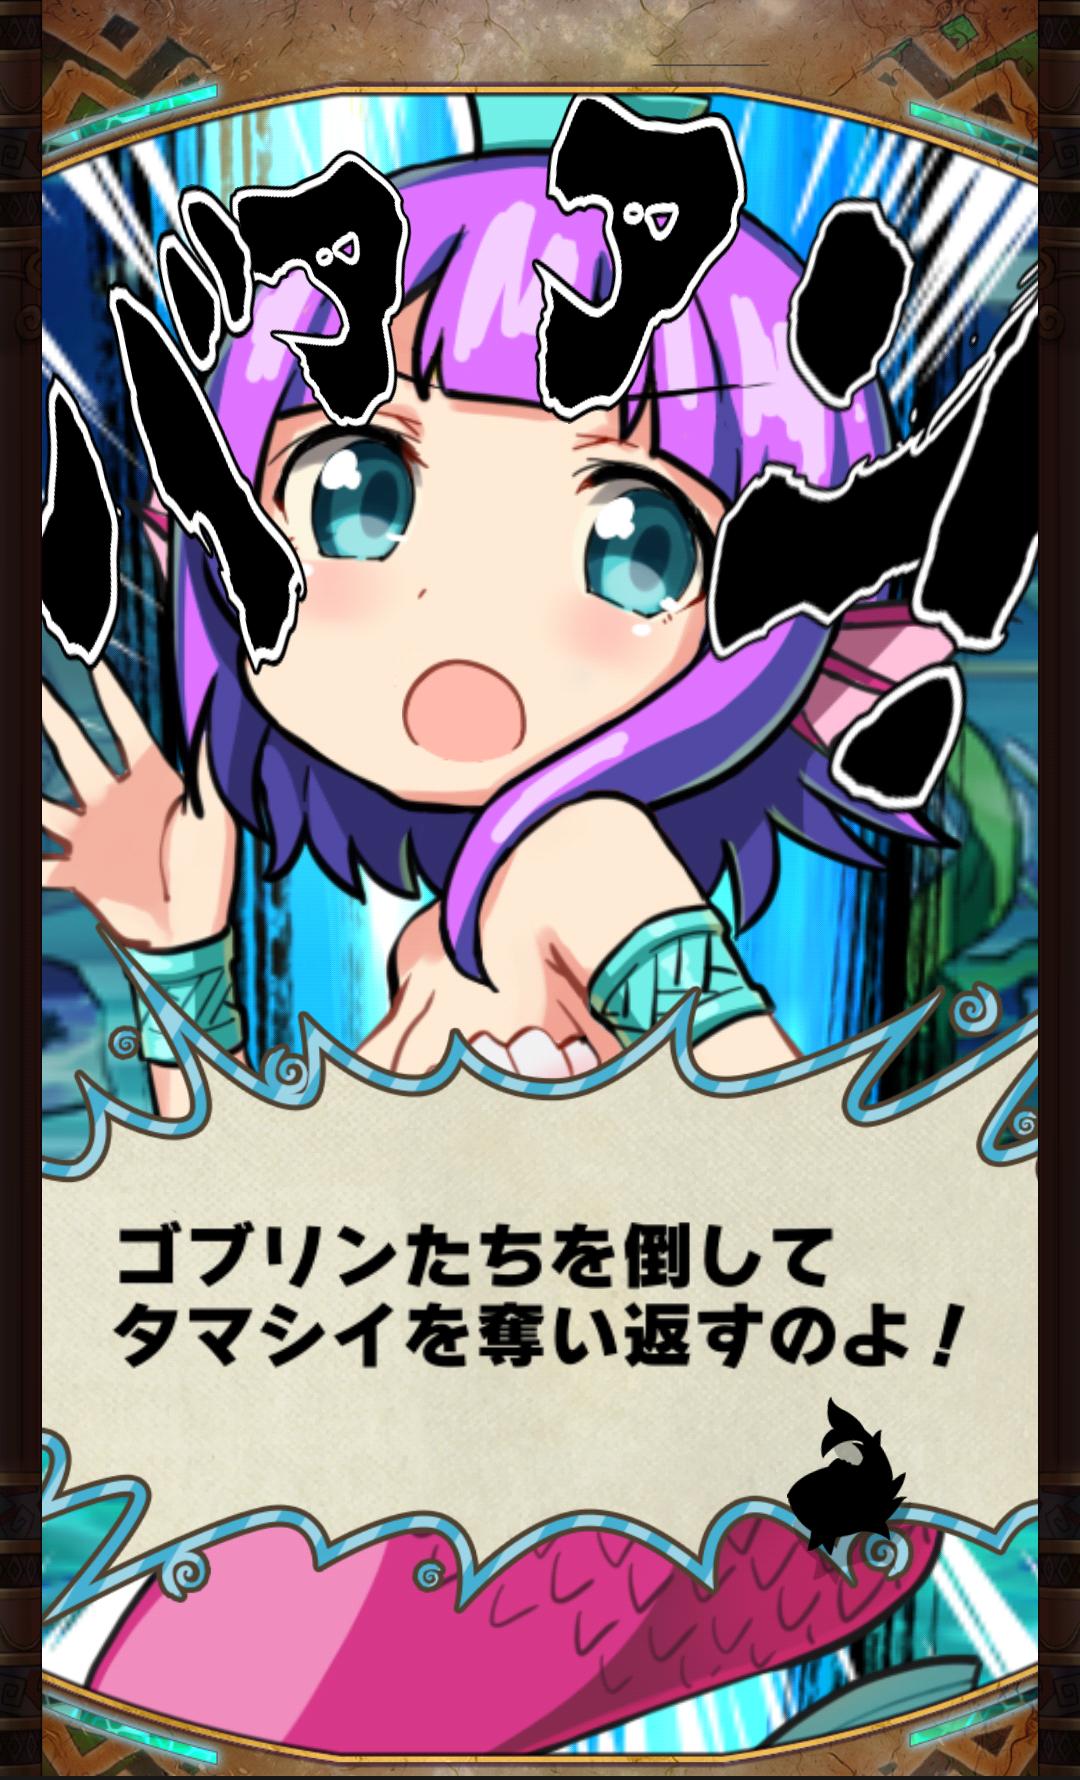 androidアプリ アニモン 人魚姫マーメの冒険攻略スクリーンショット6